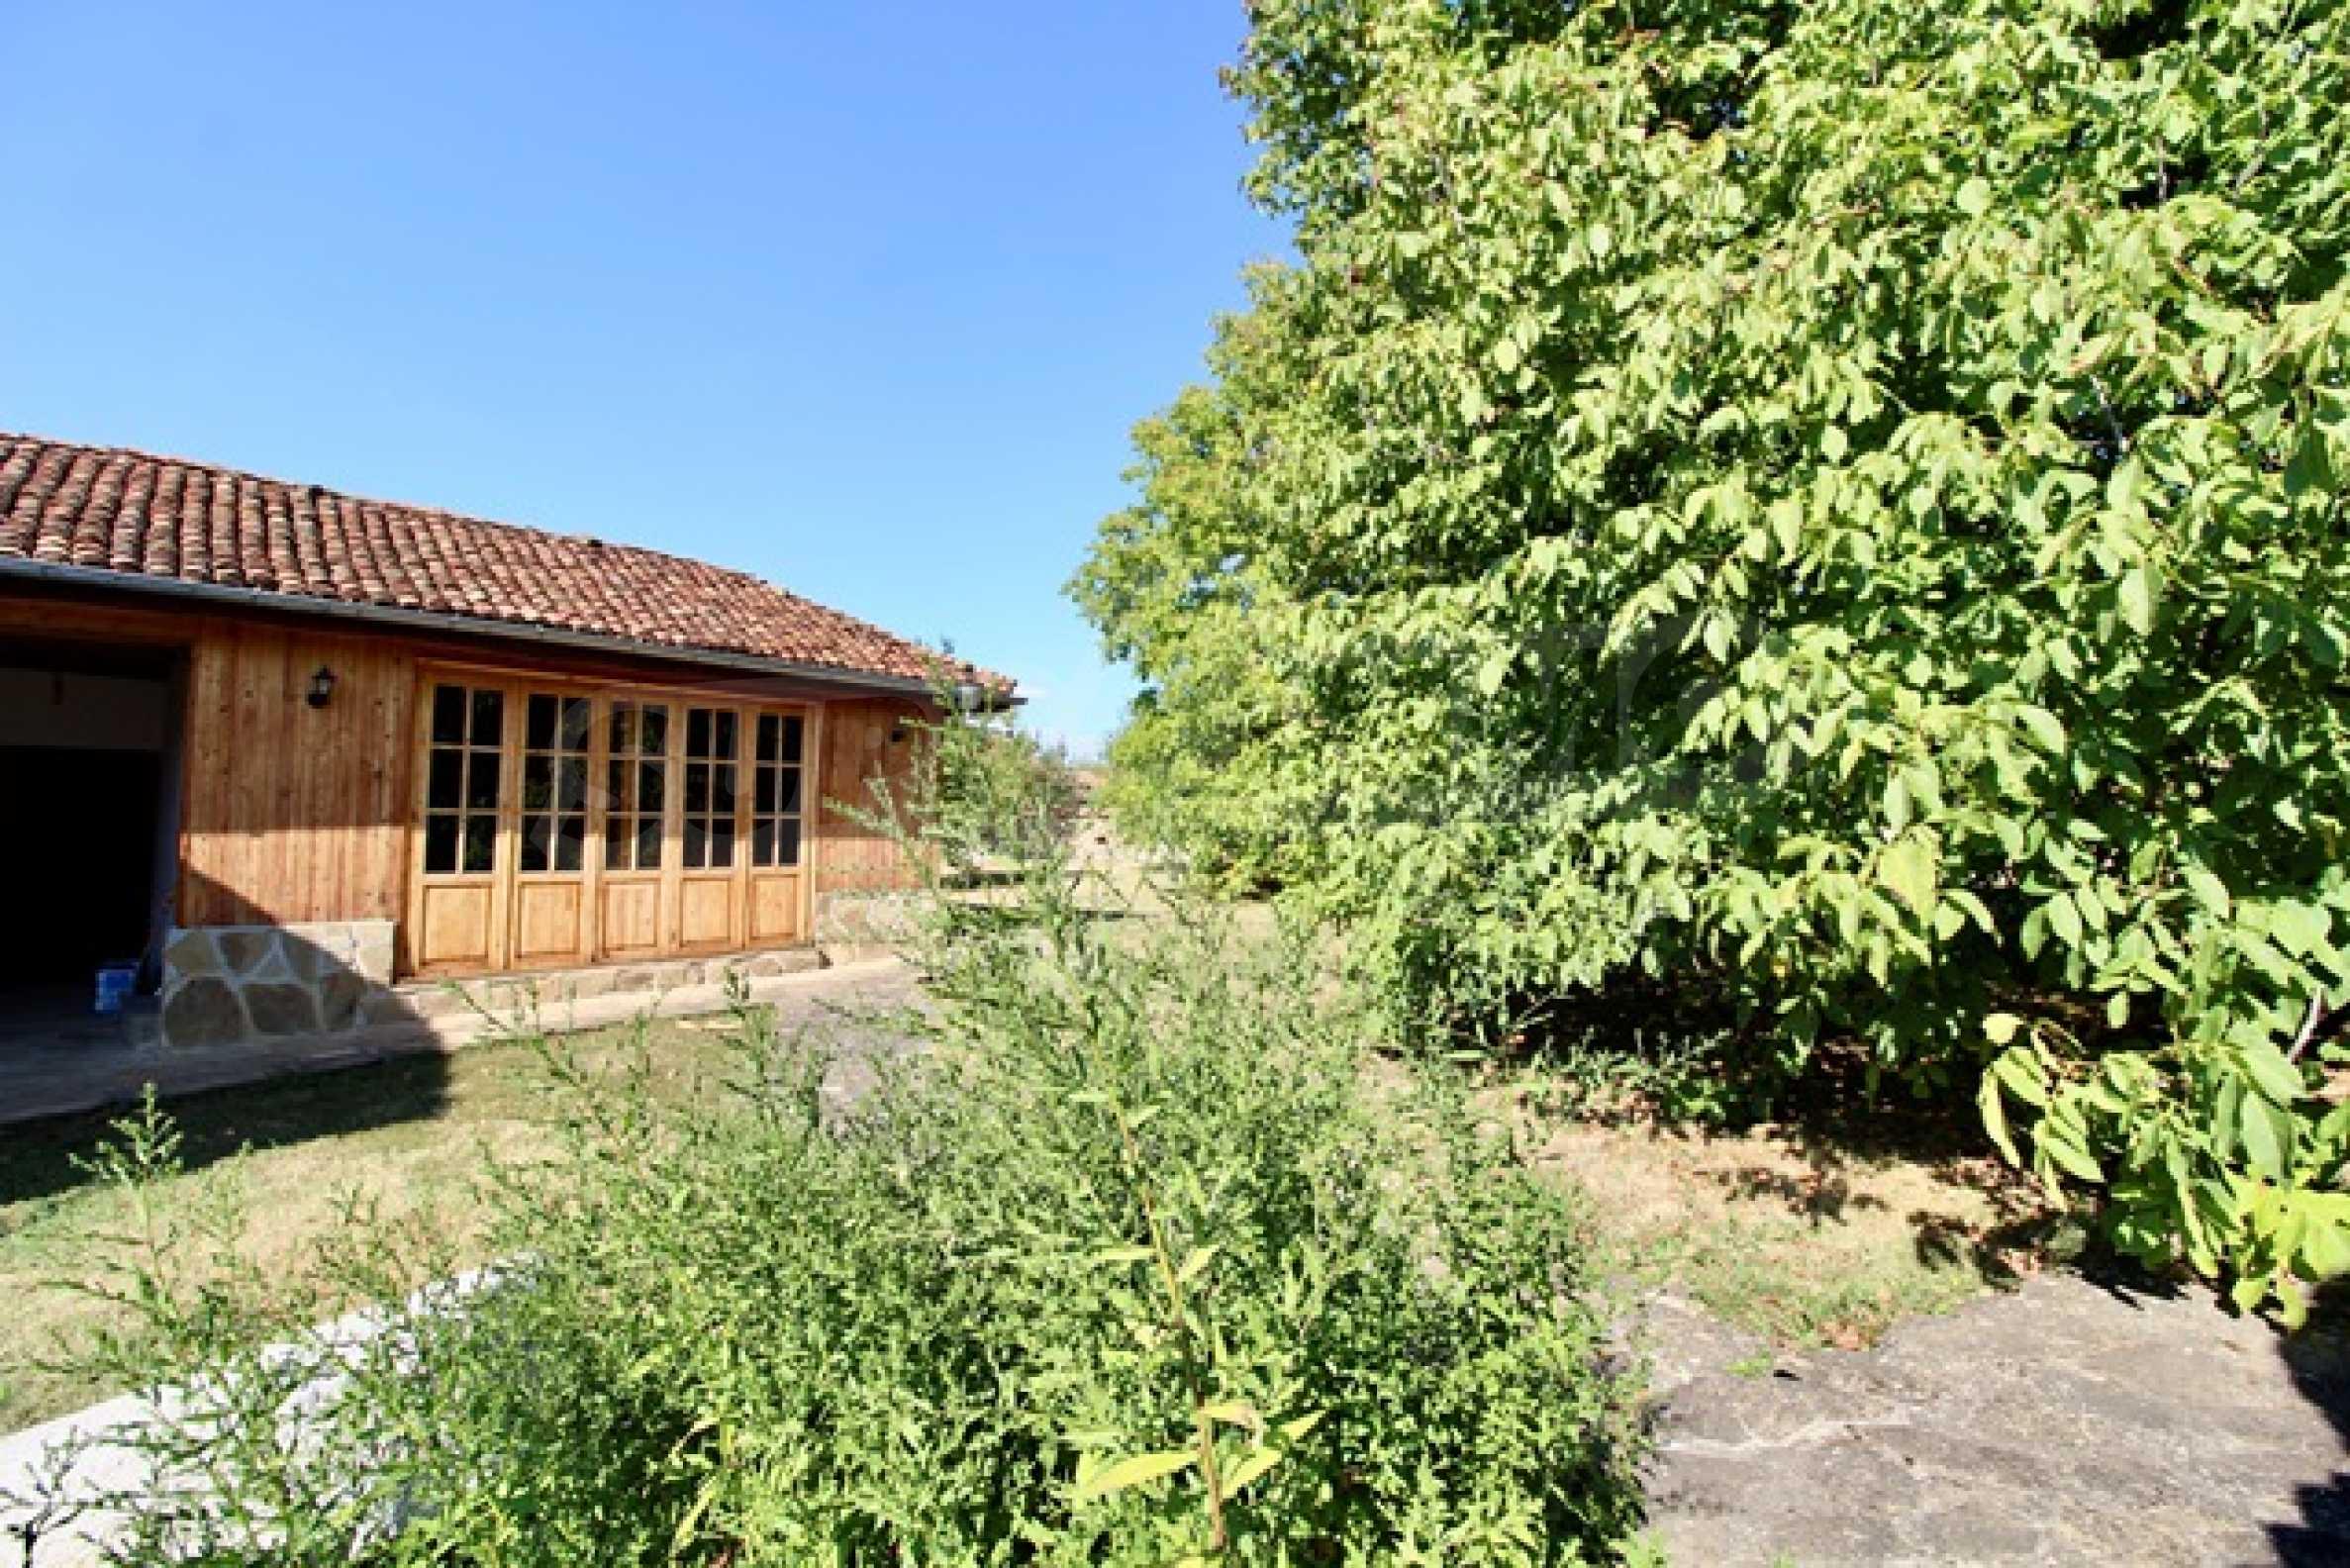 Lovely old house just 17 km away from Veliko Tarnovo 27